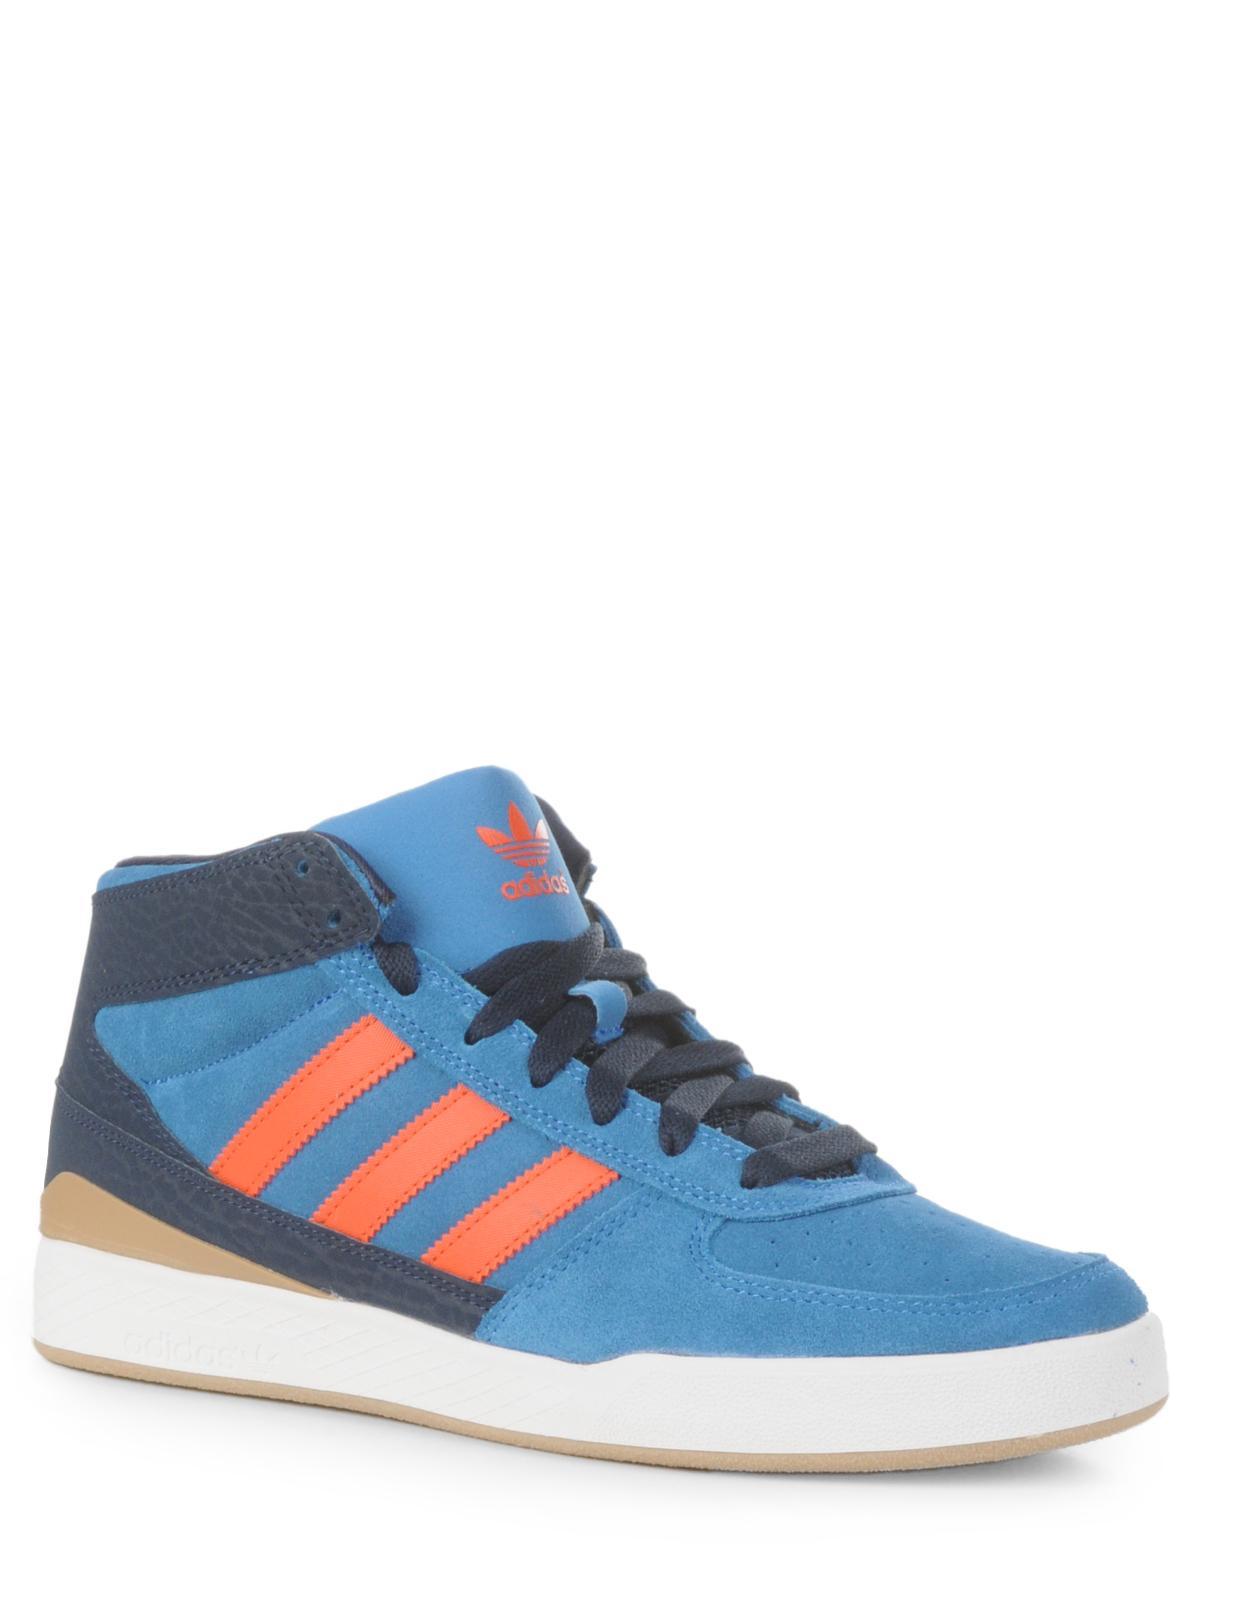 Adidas Azul Y Naranja